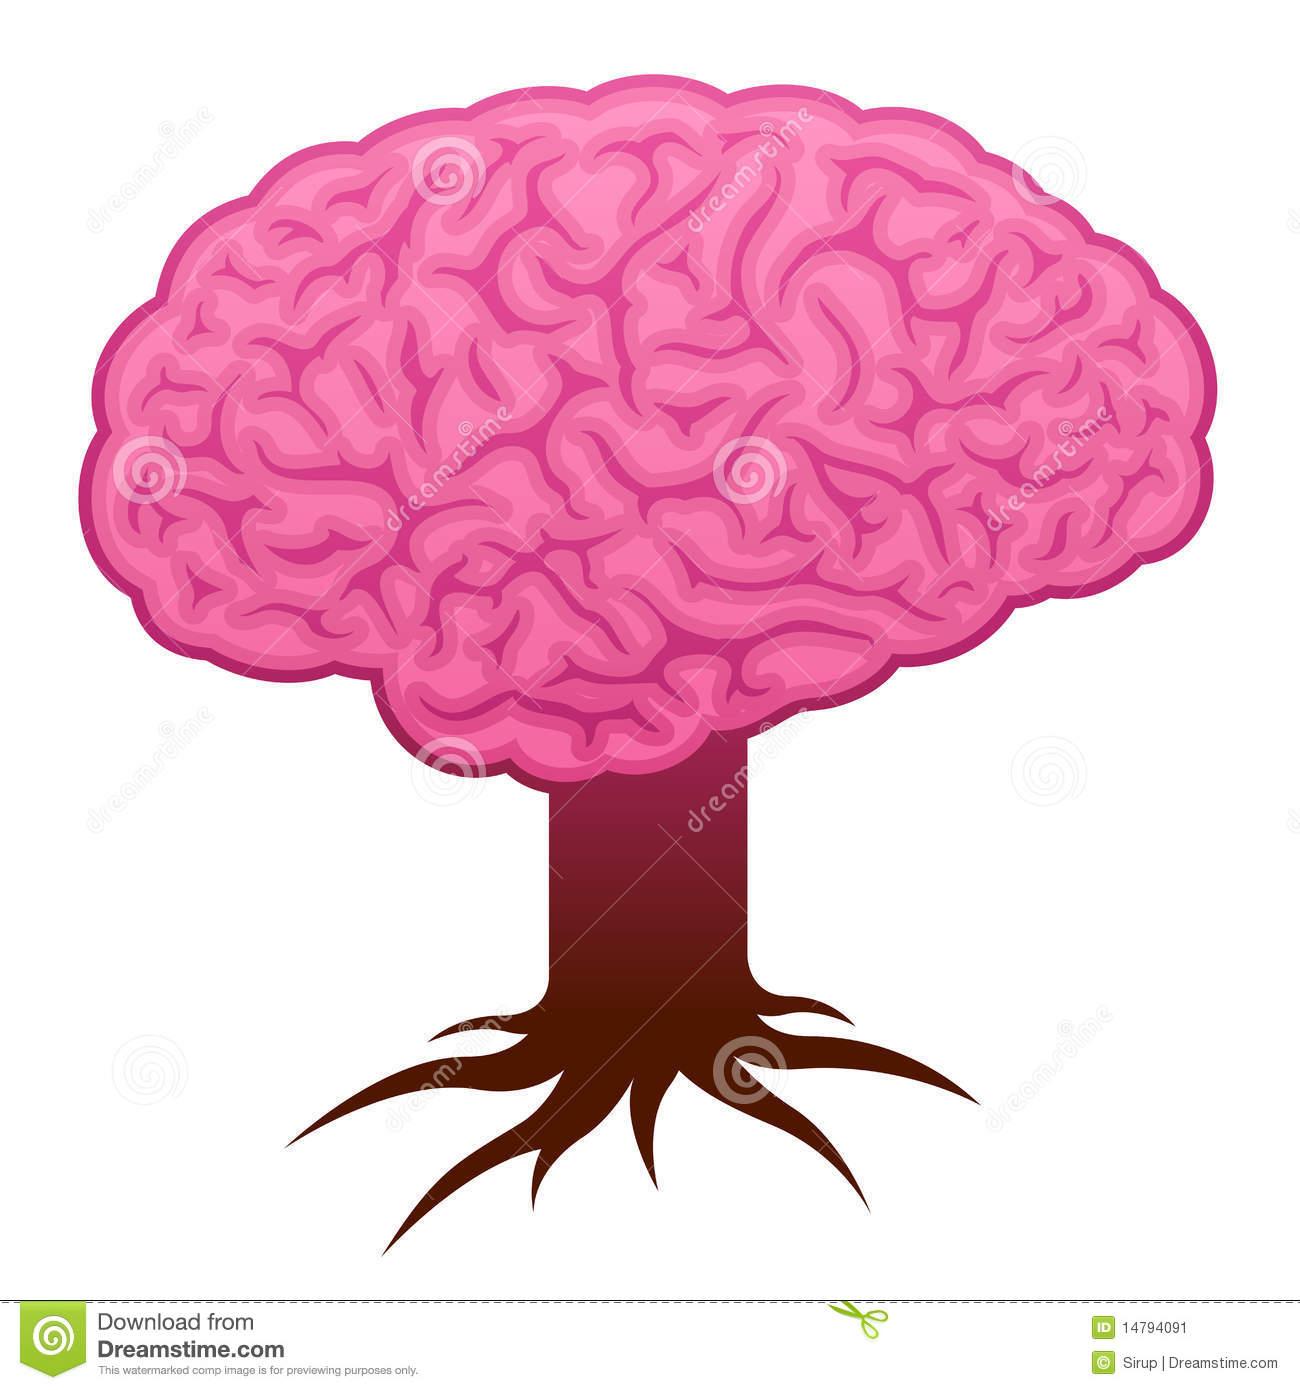 Brain Stem / Cerebellum / Optical Nerve / Female Brain Anatomy.